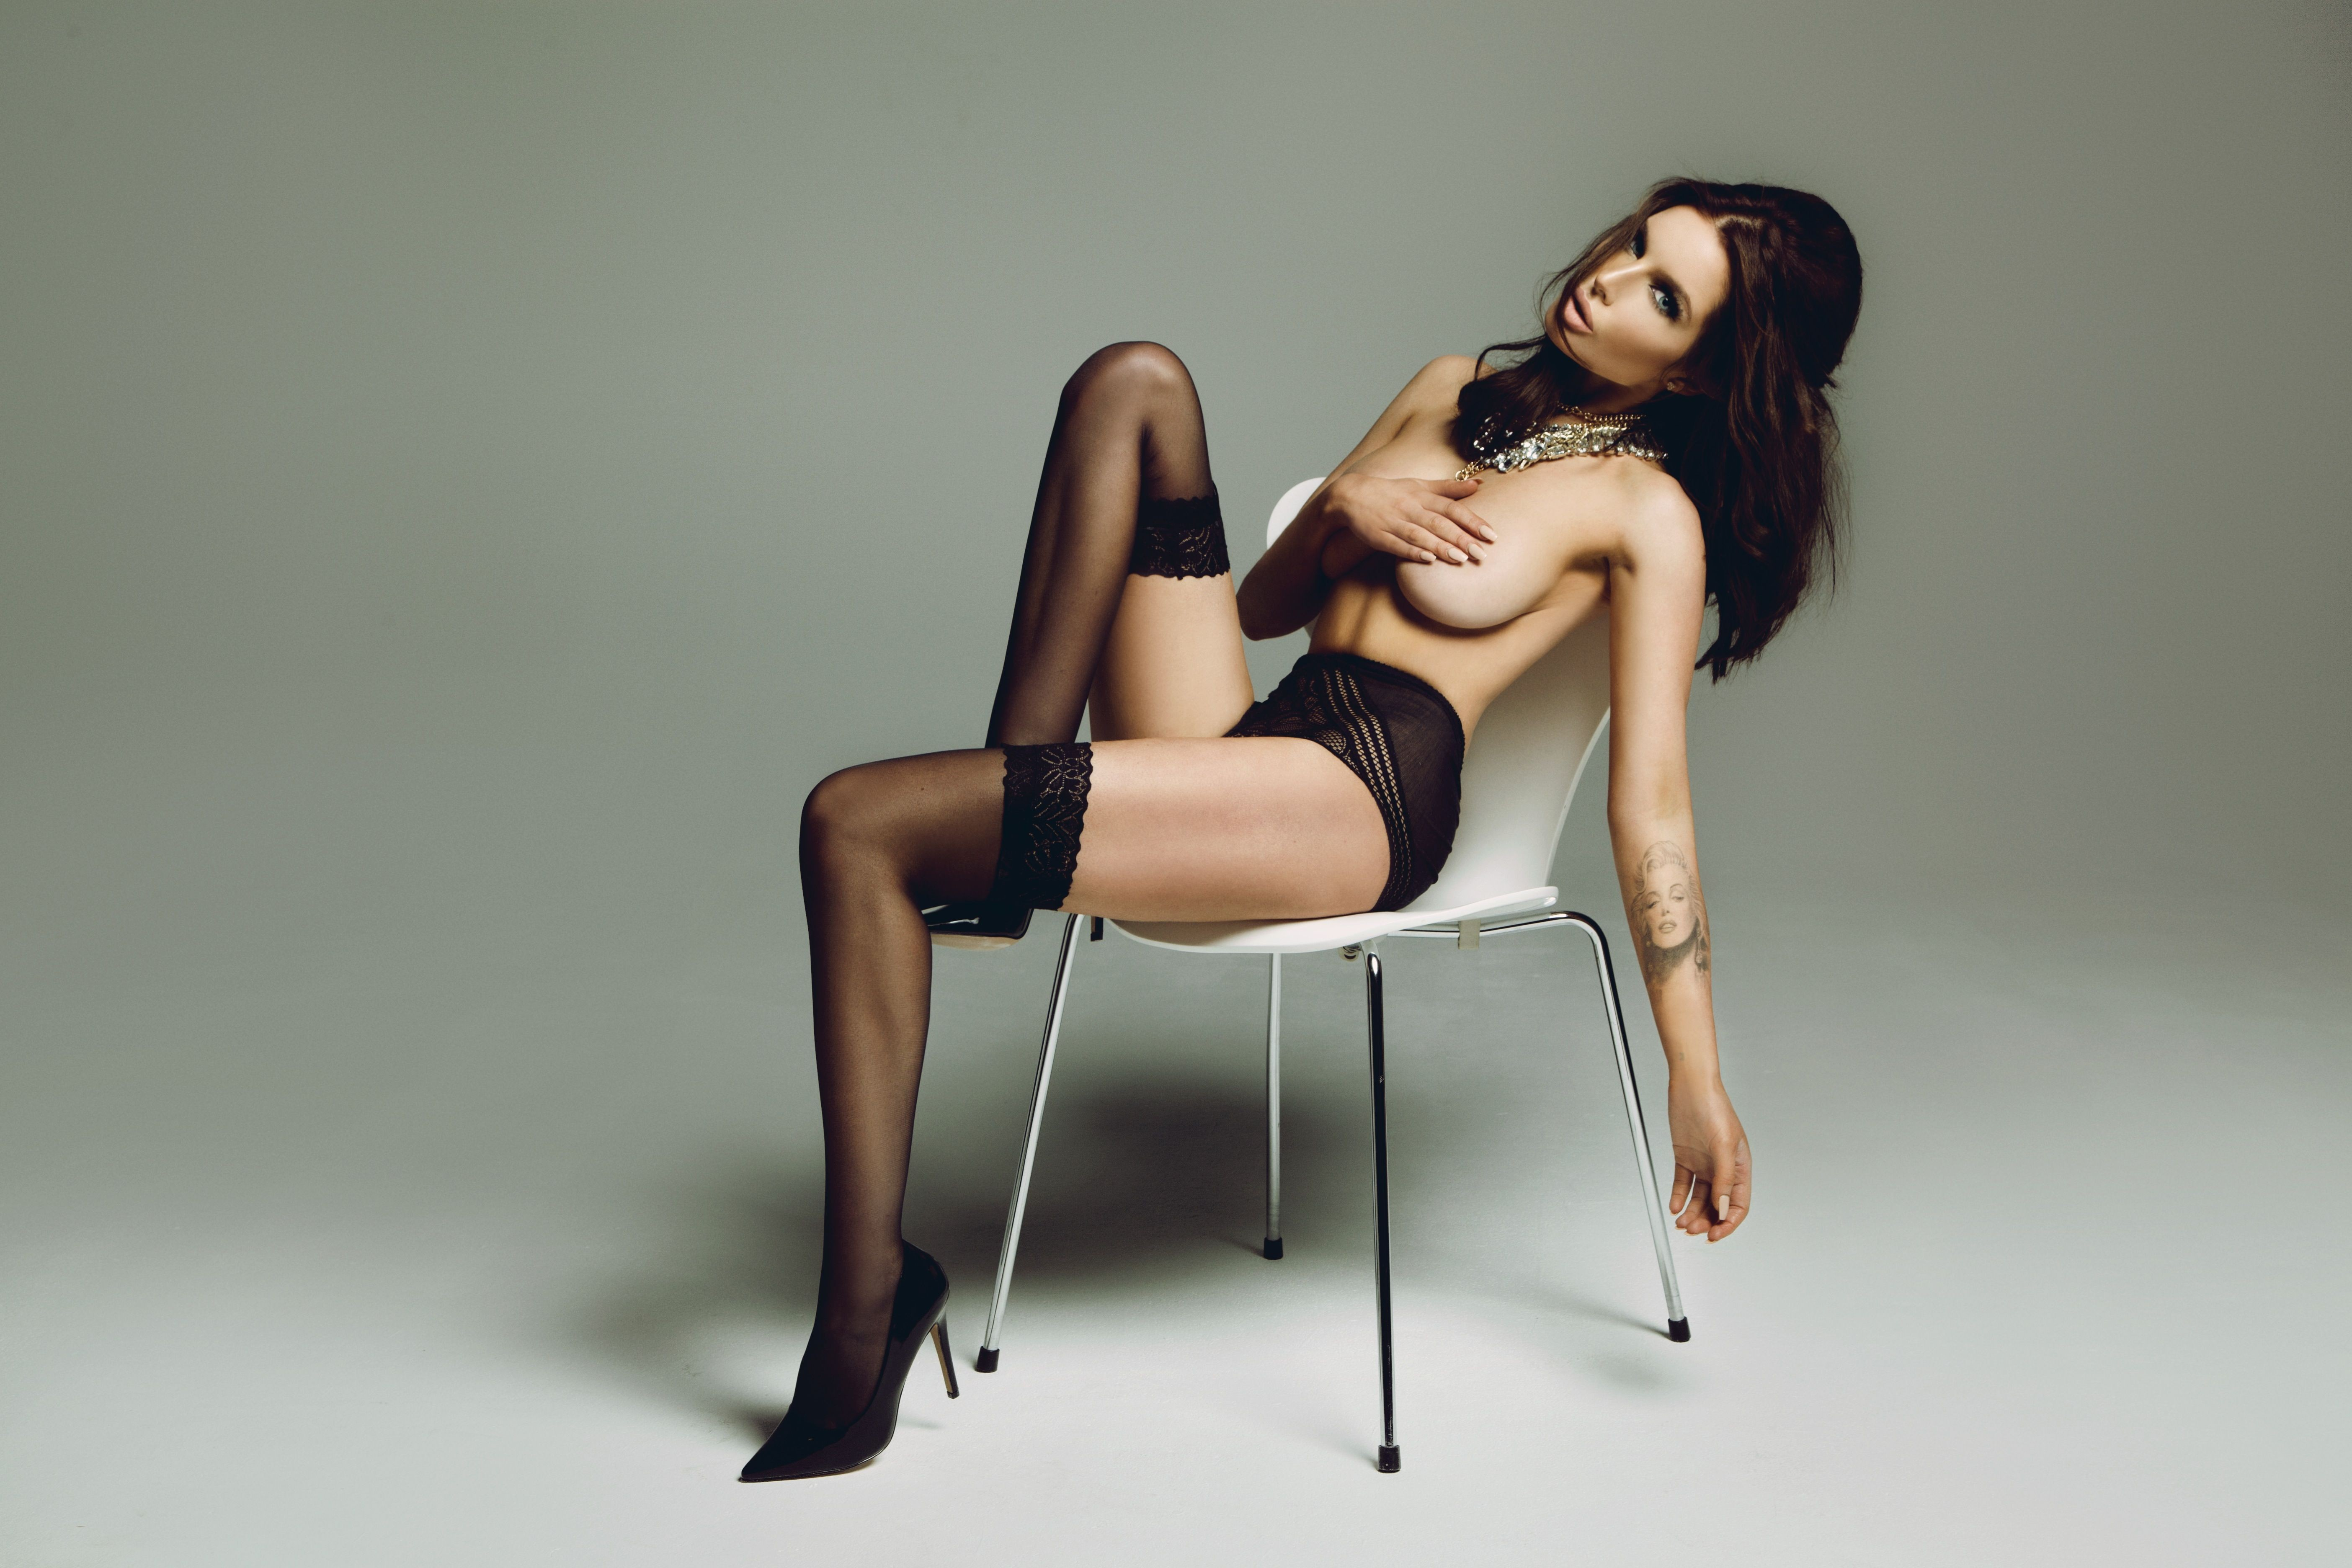 Helen pearson nude ass pussy